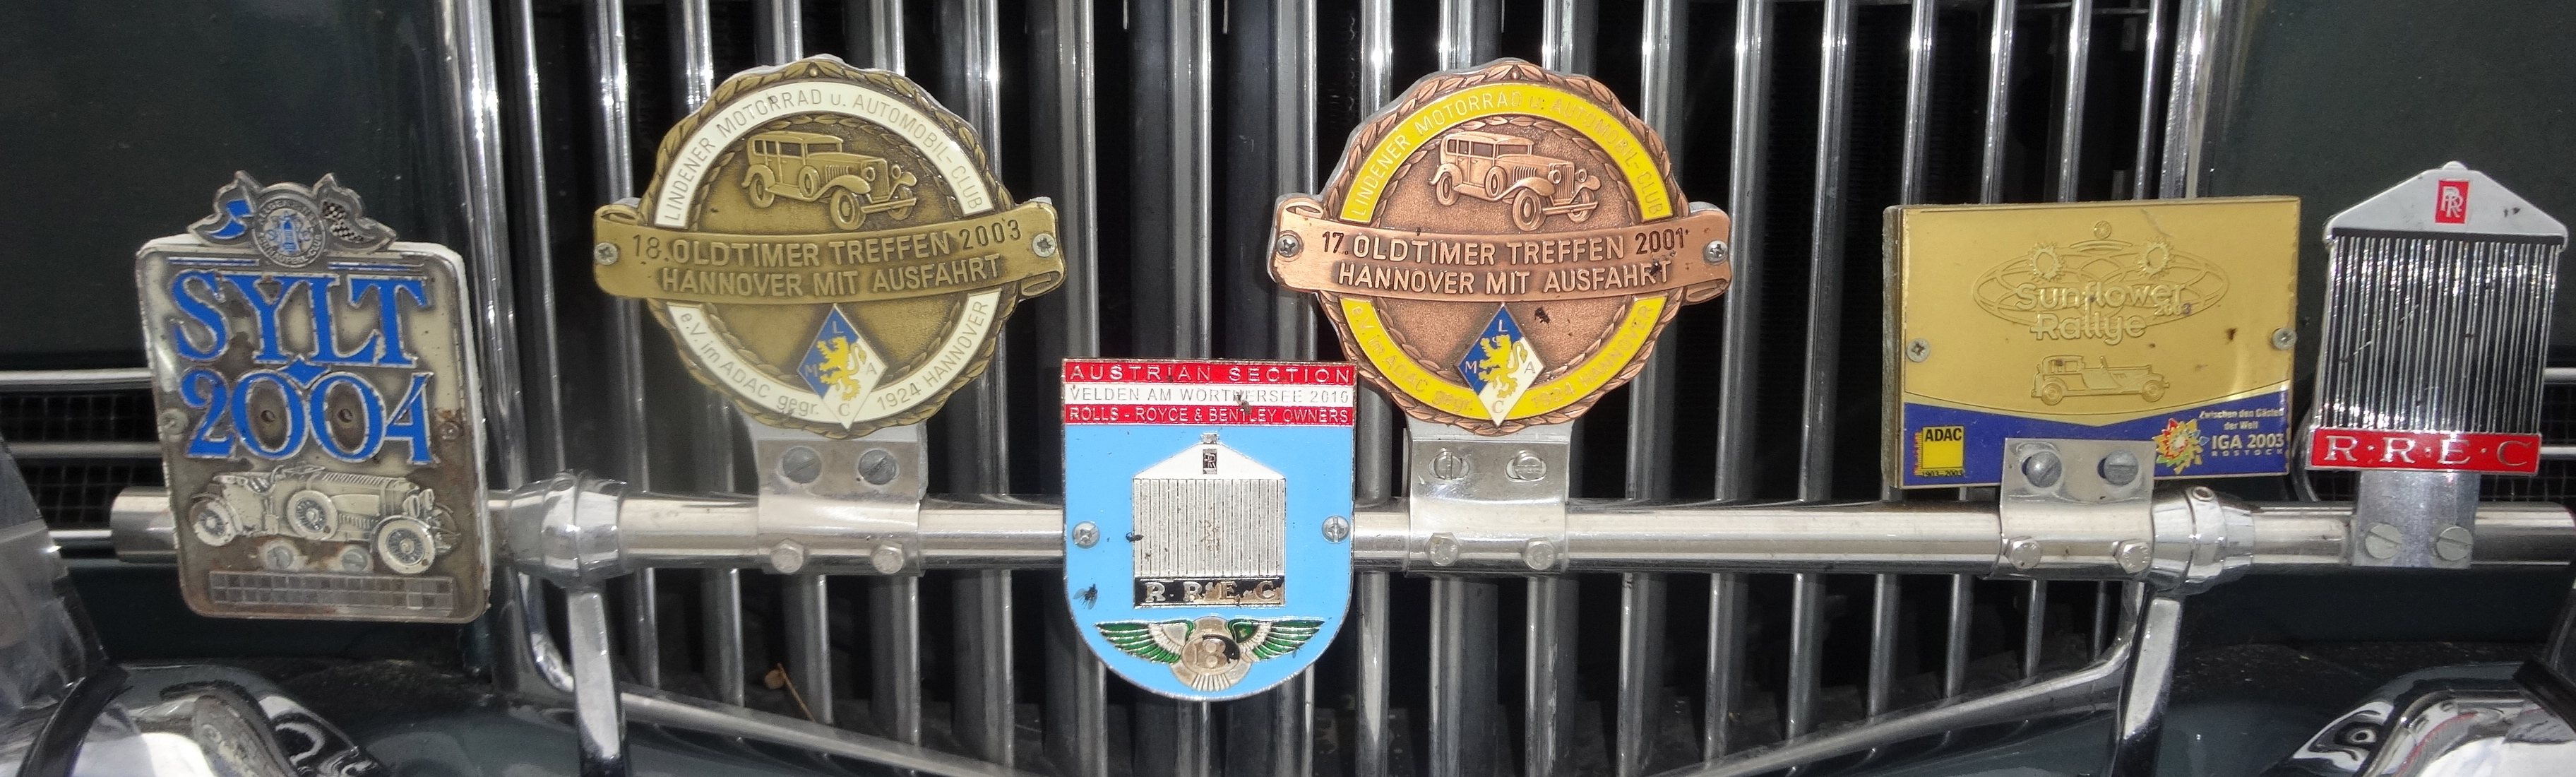 Rallye badges / Teilnehmer-Plaketten